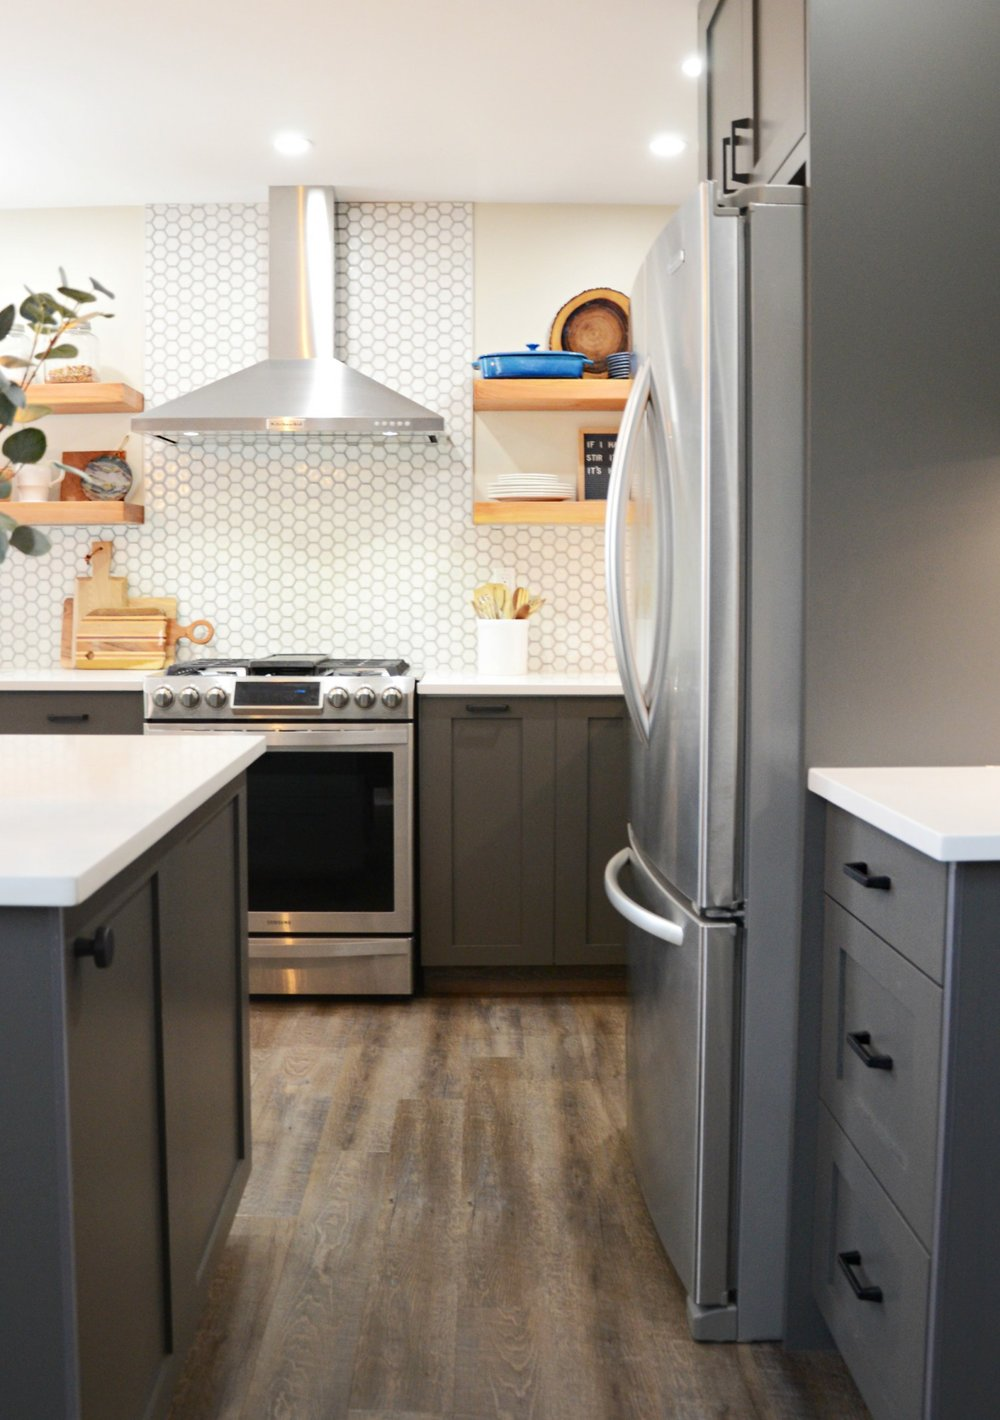 calgary-interior-design-kitchen-renovation-modern-farmhouse-23.jpg